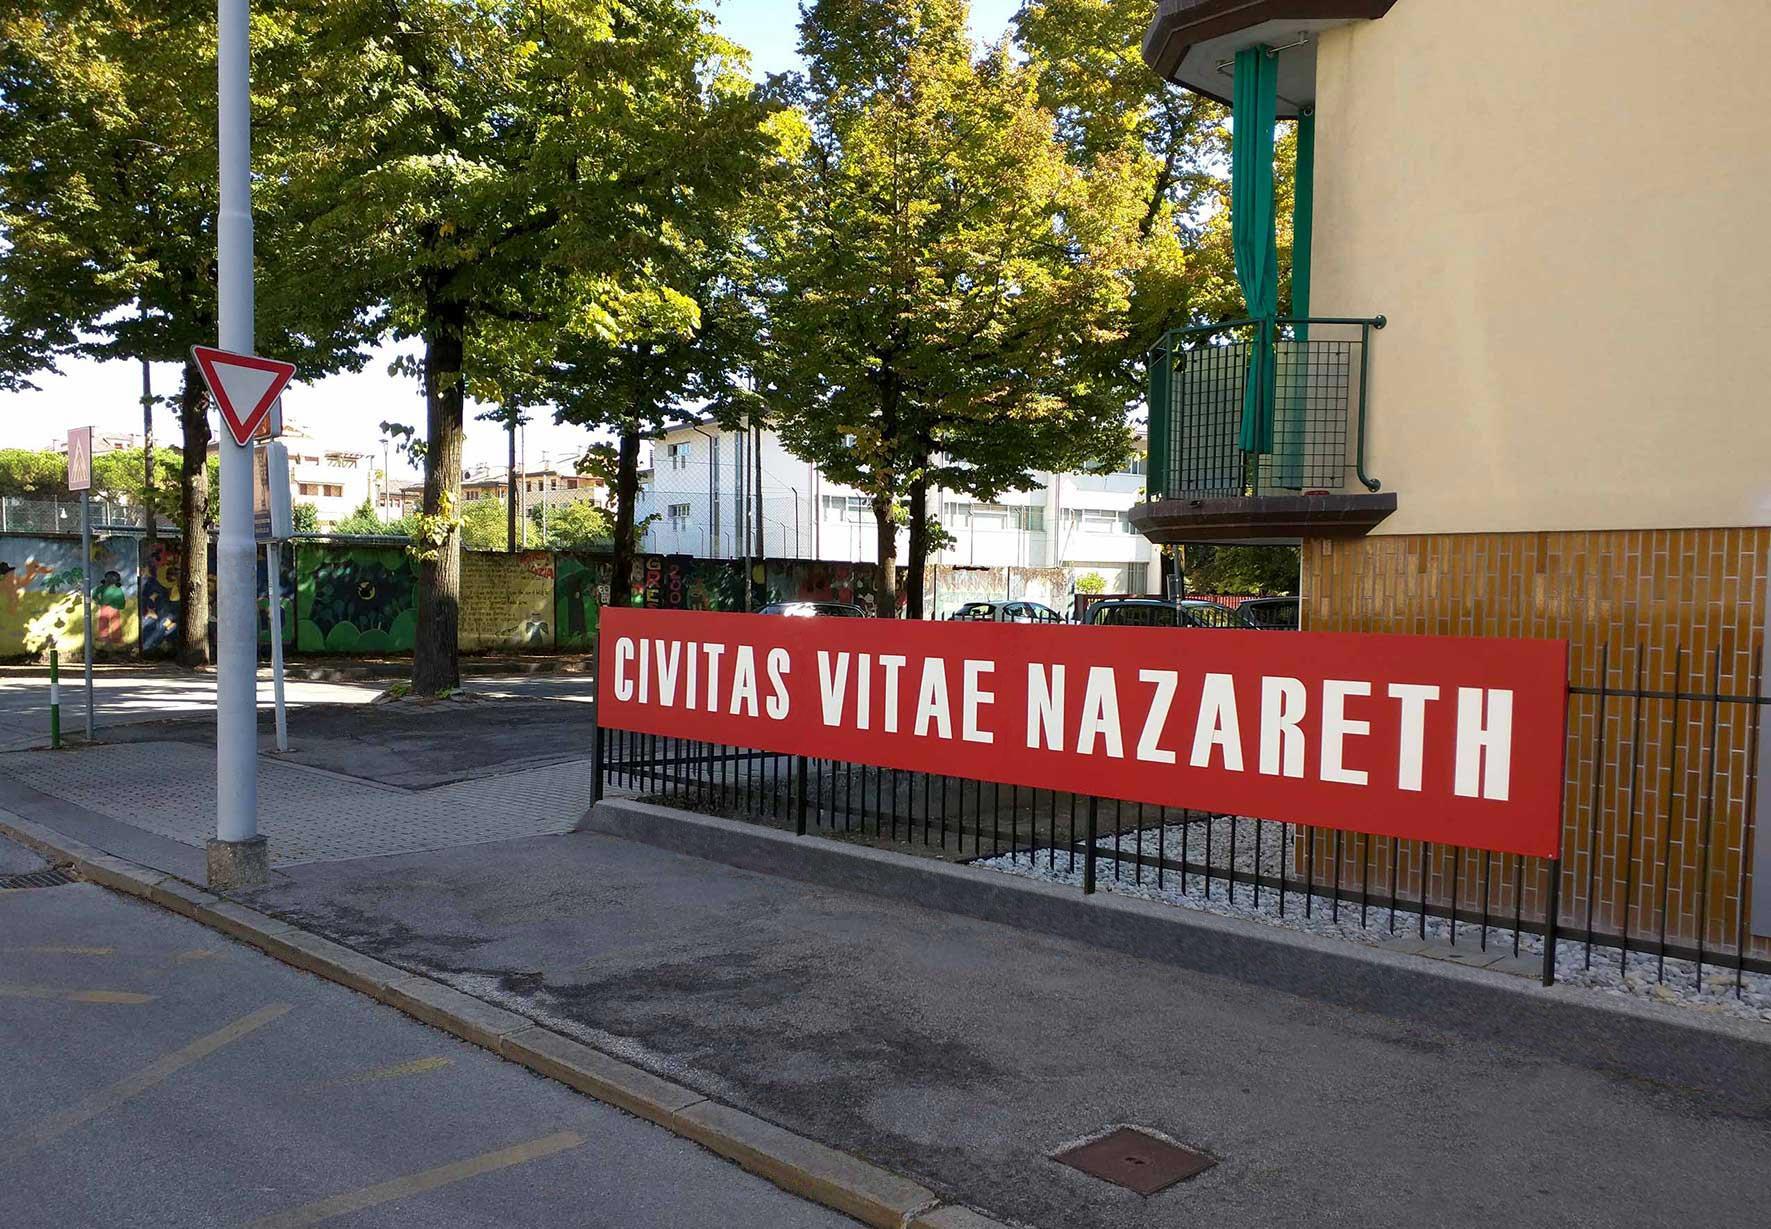 Nazareth_7-2